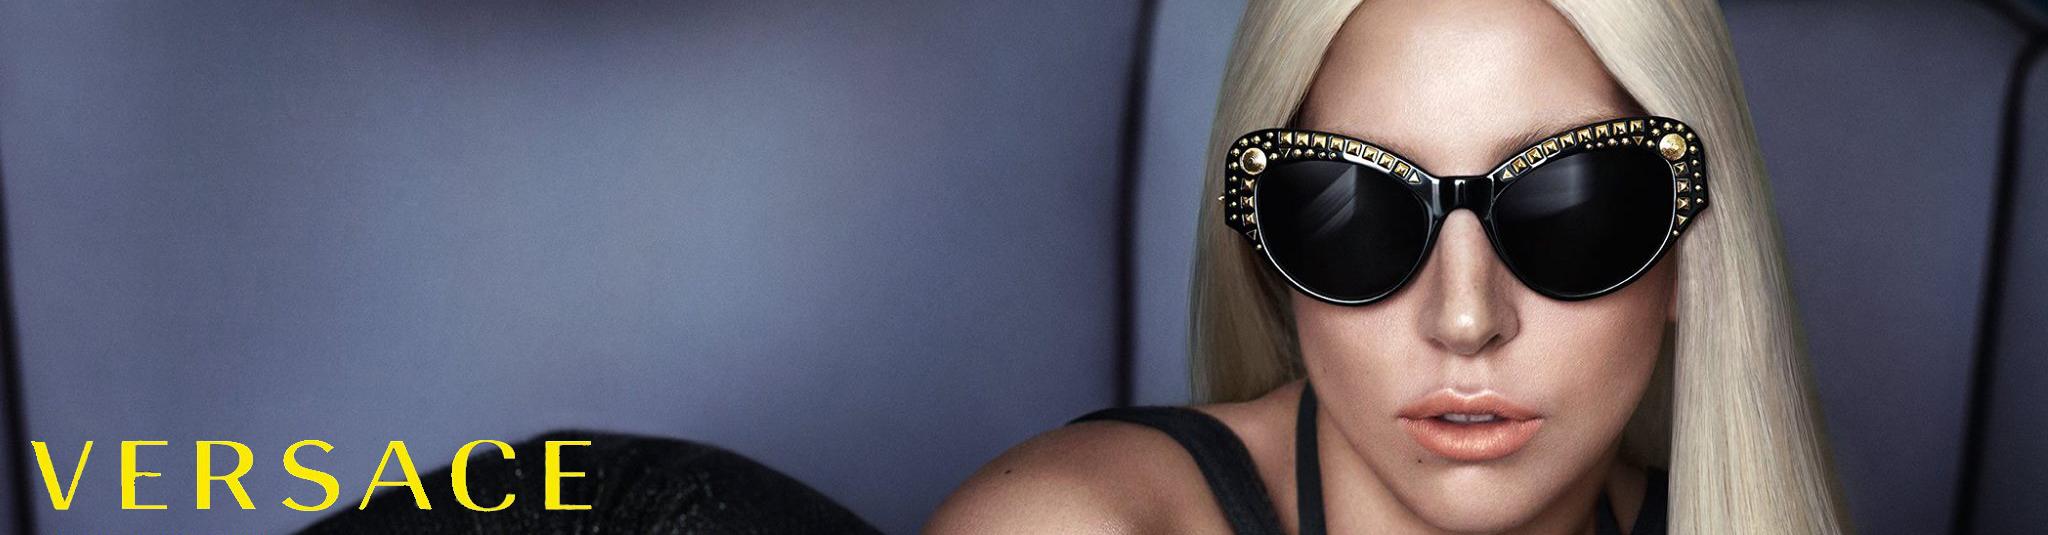 Versace2 - designer eyeframes